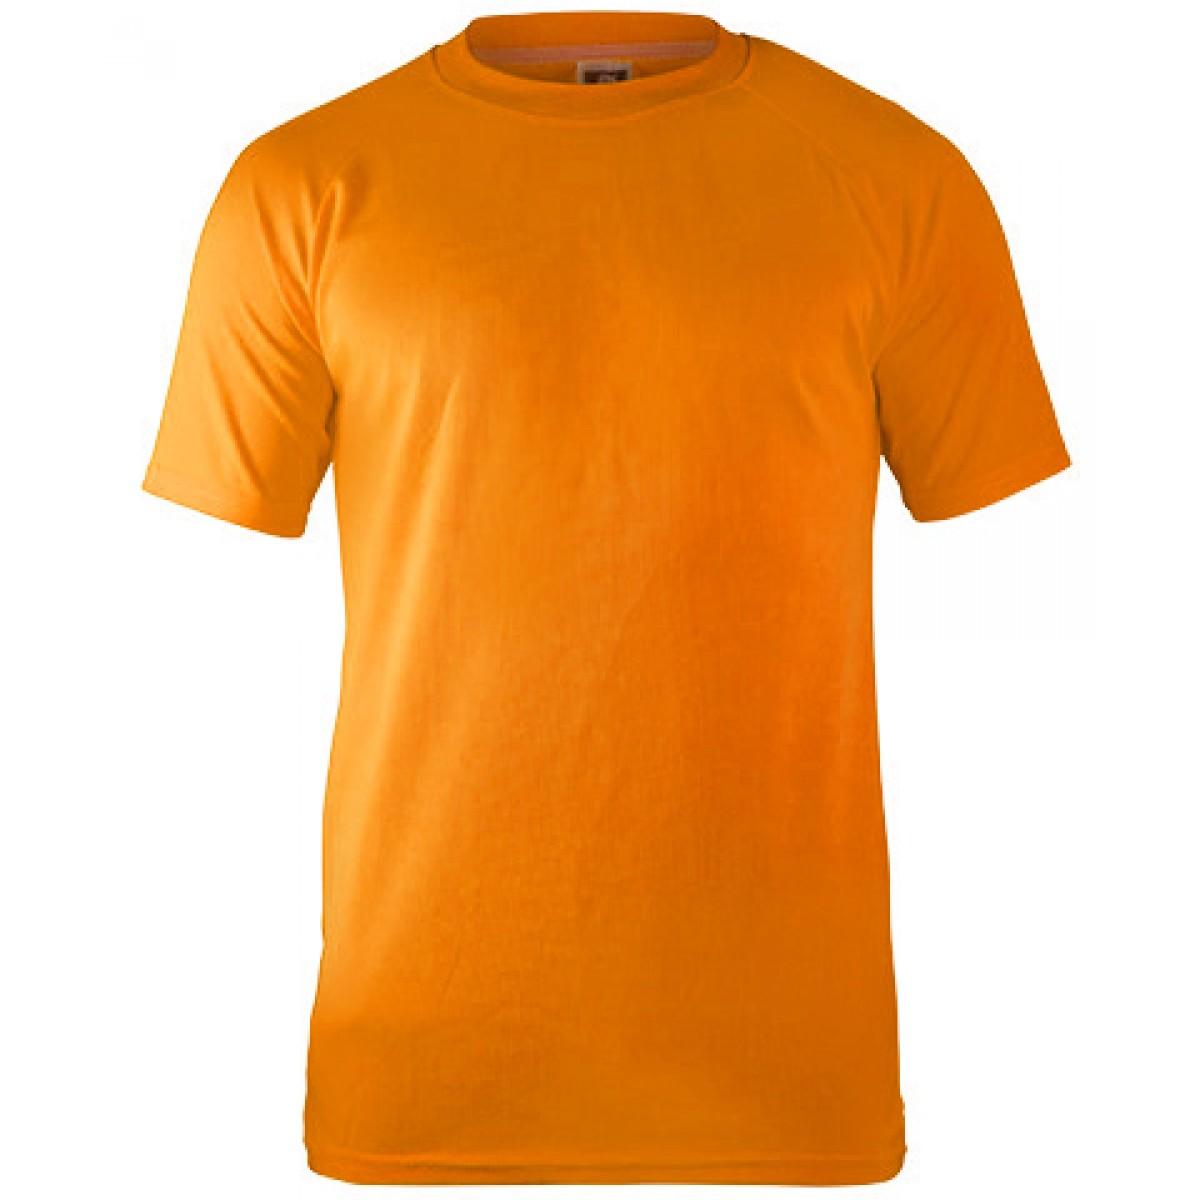 Short Sleeves Mesh Performance T-shirt-Safety Orange-XL